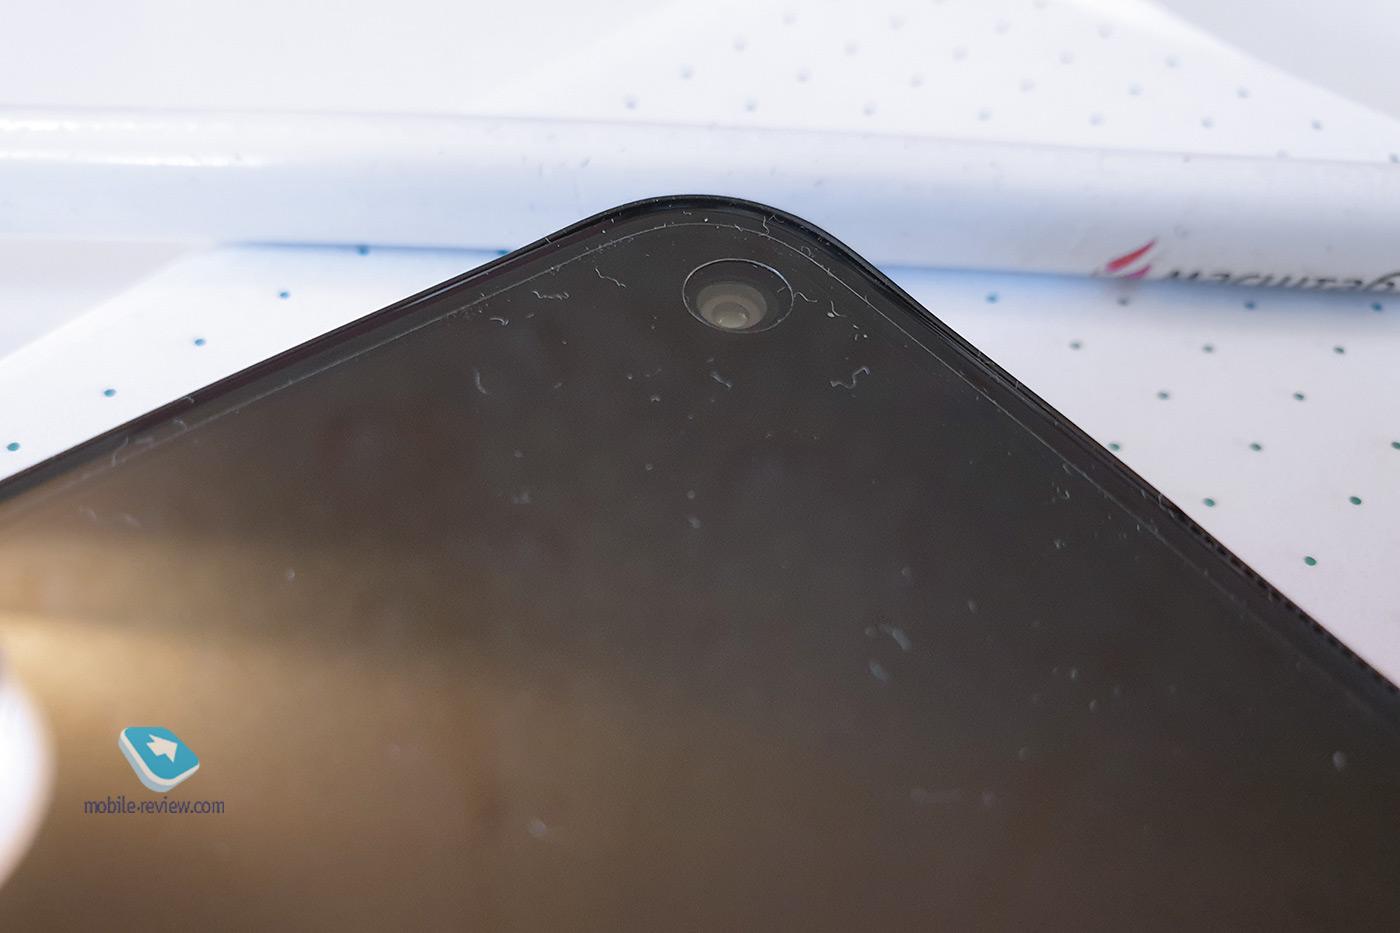 Обзор Redmi Note 9: когда выгода очевидна